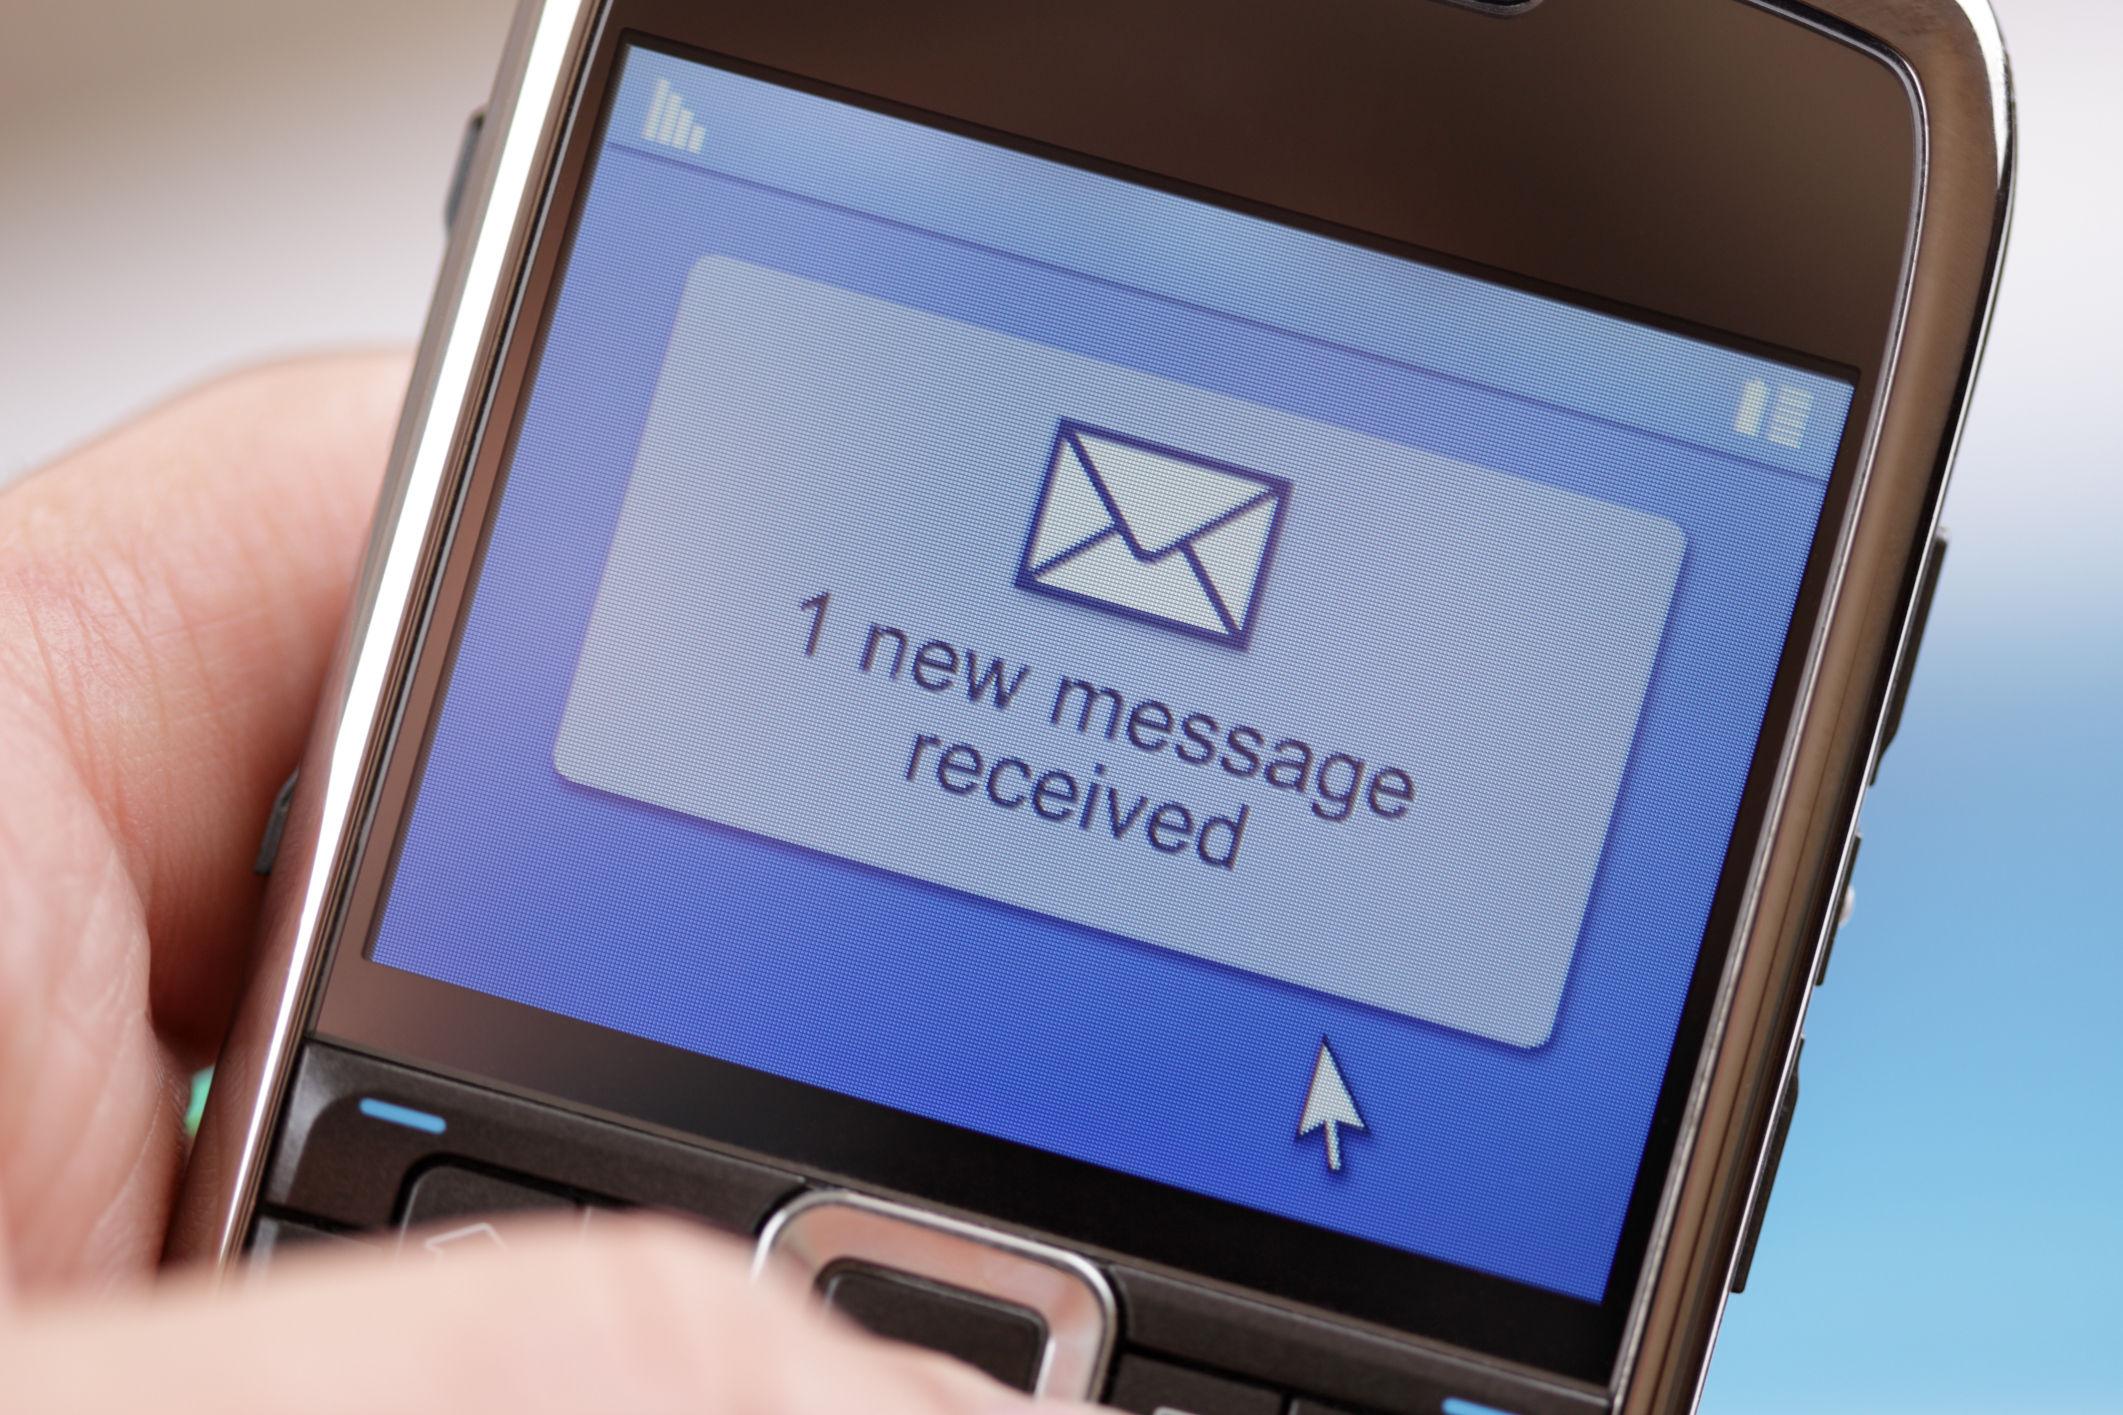 echo de menos sms